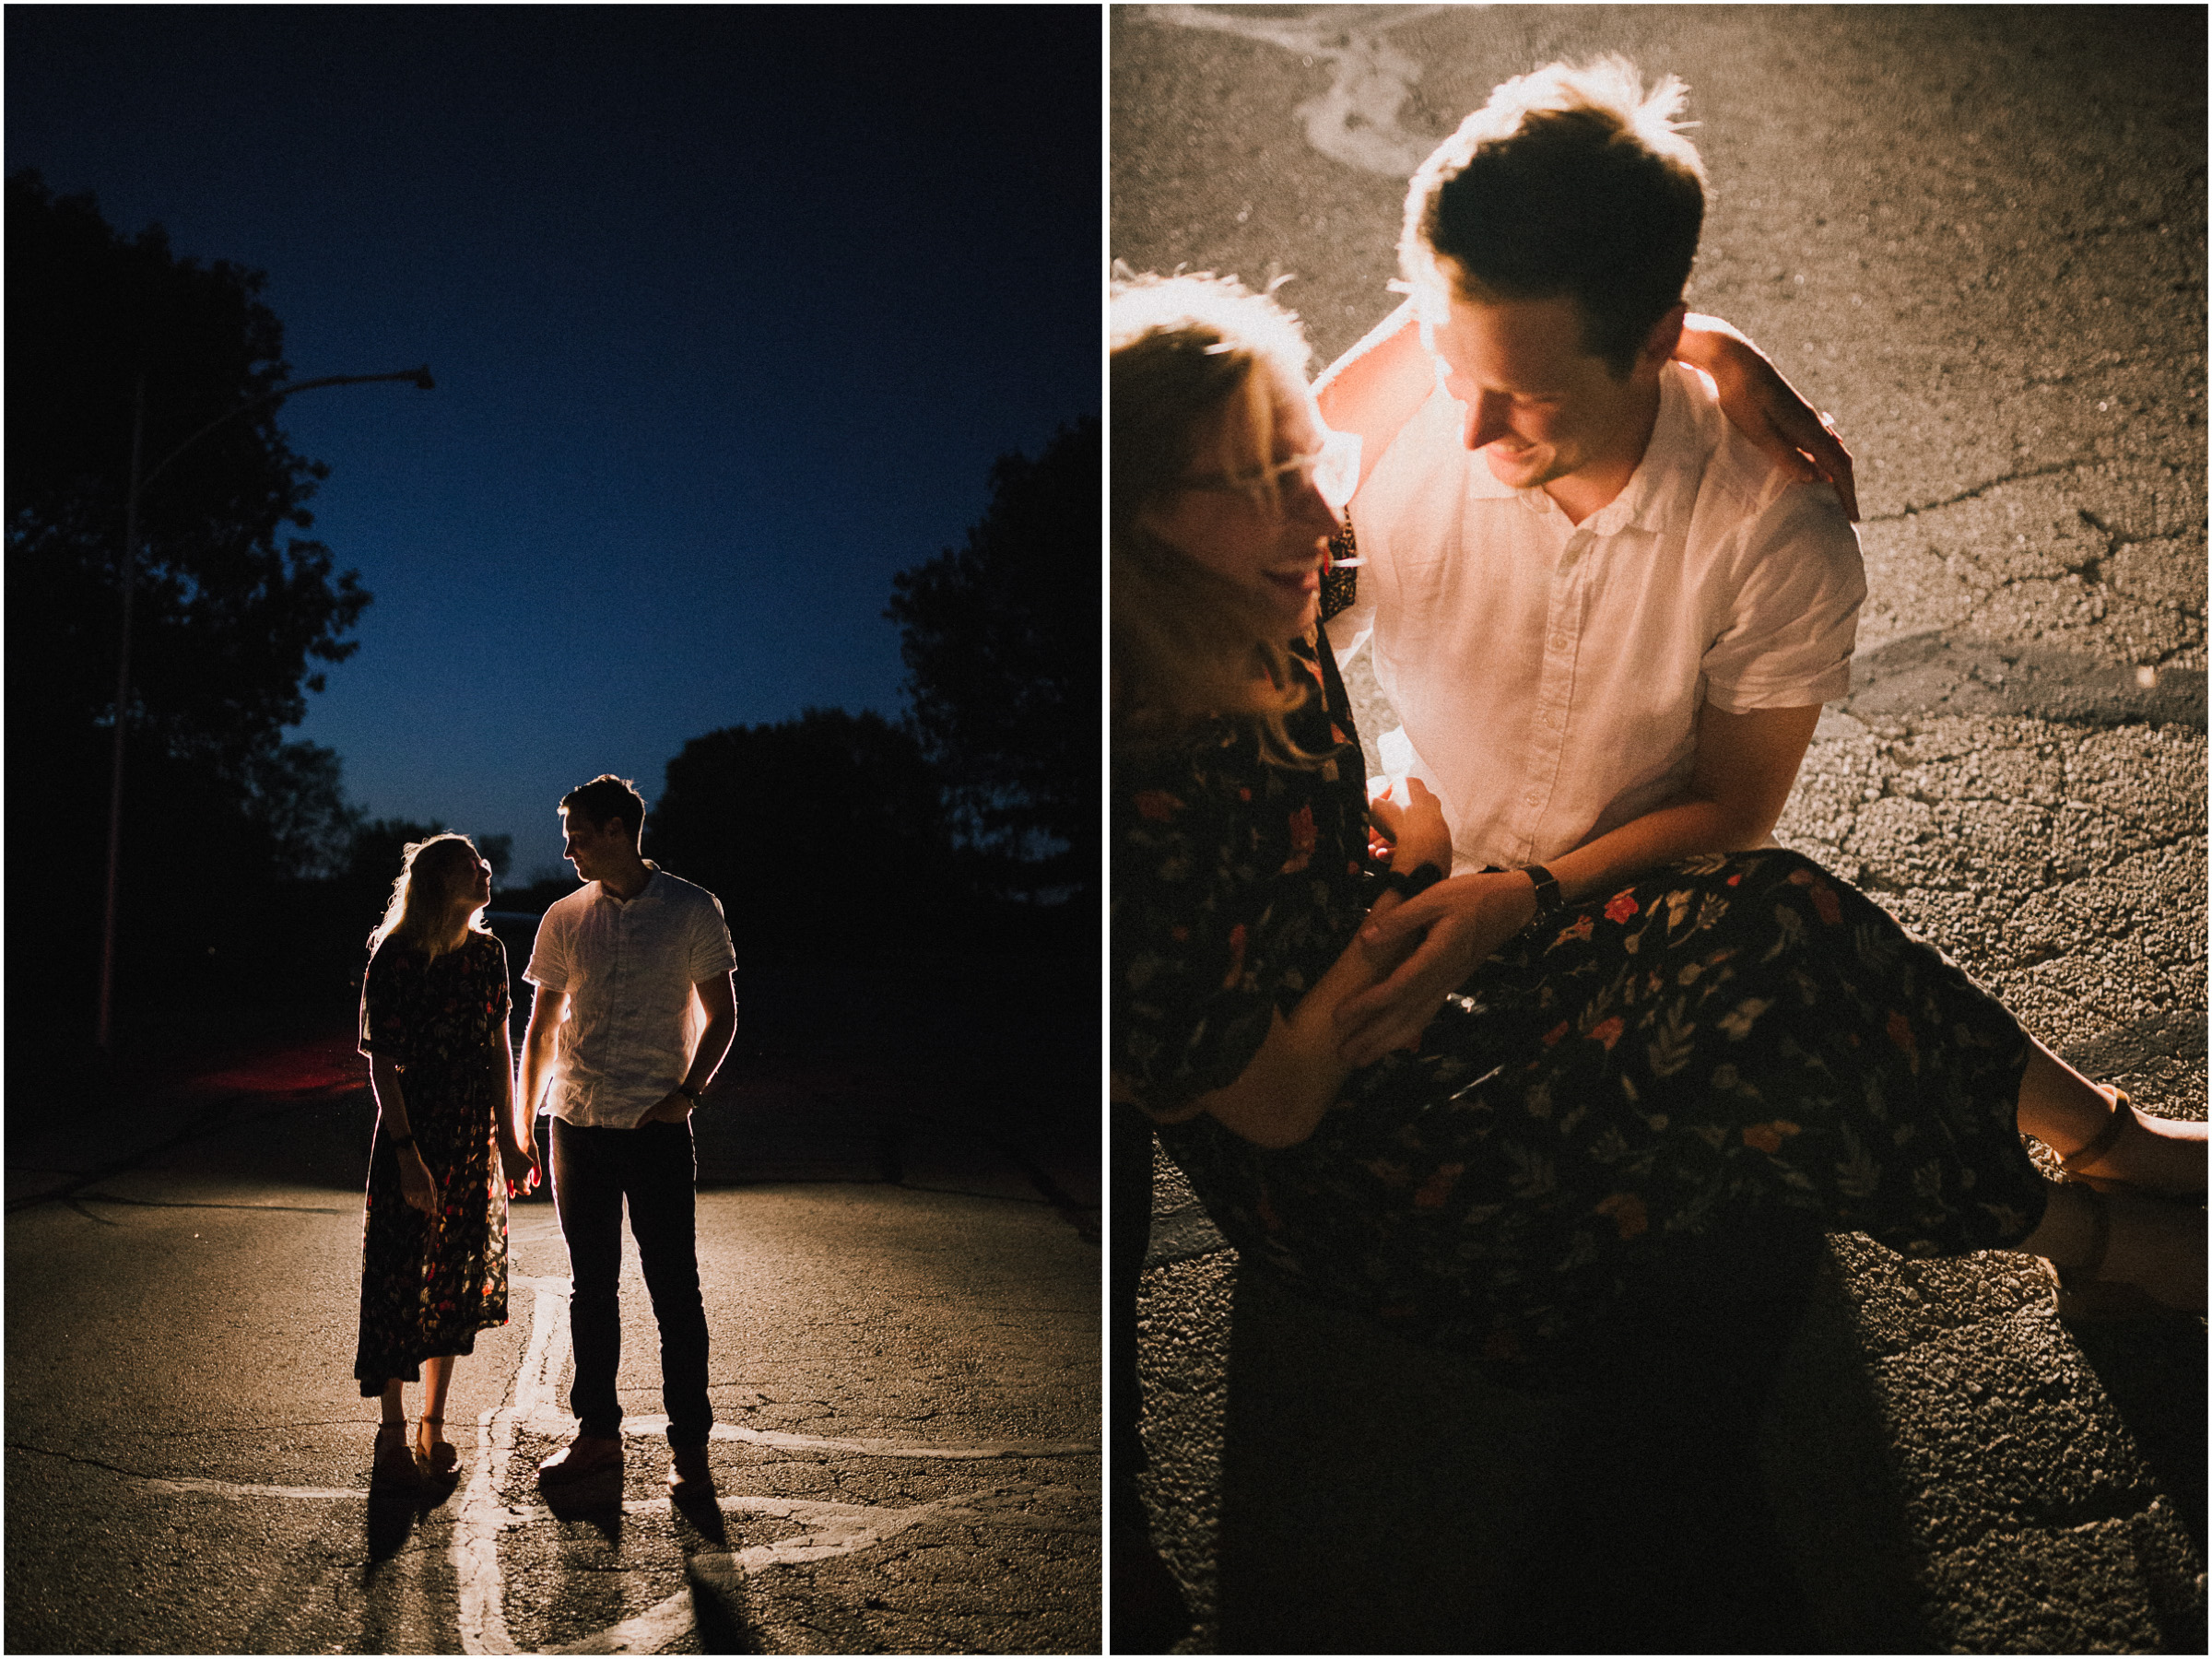 alyssa barletter photography artsy engagement photos headlight car nighttime fun-4.jpg